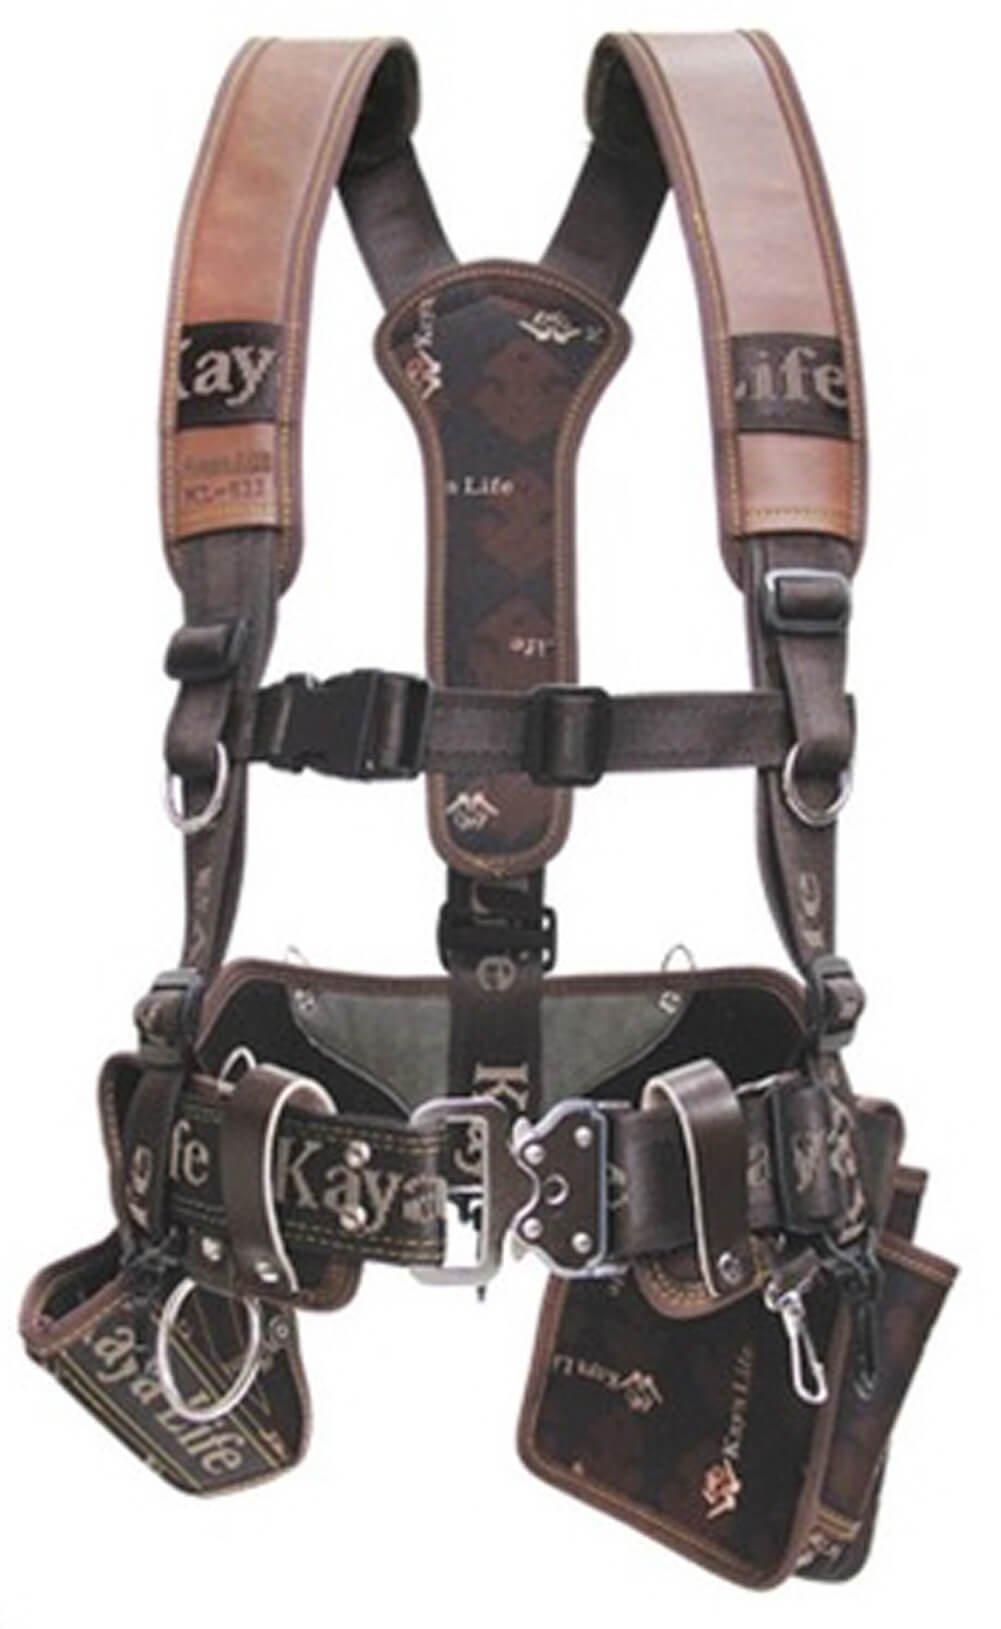 Tools Holsters Drill Holsters Wide Belt Shoulder Suspension Spike Nail Pocket 4 Sets